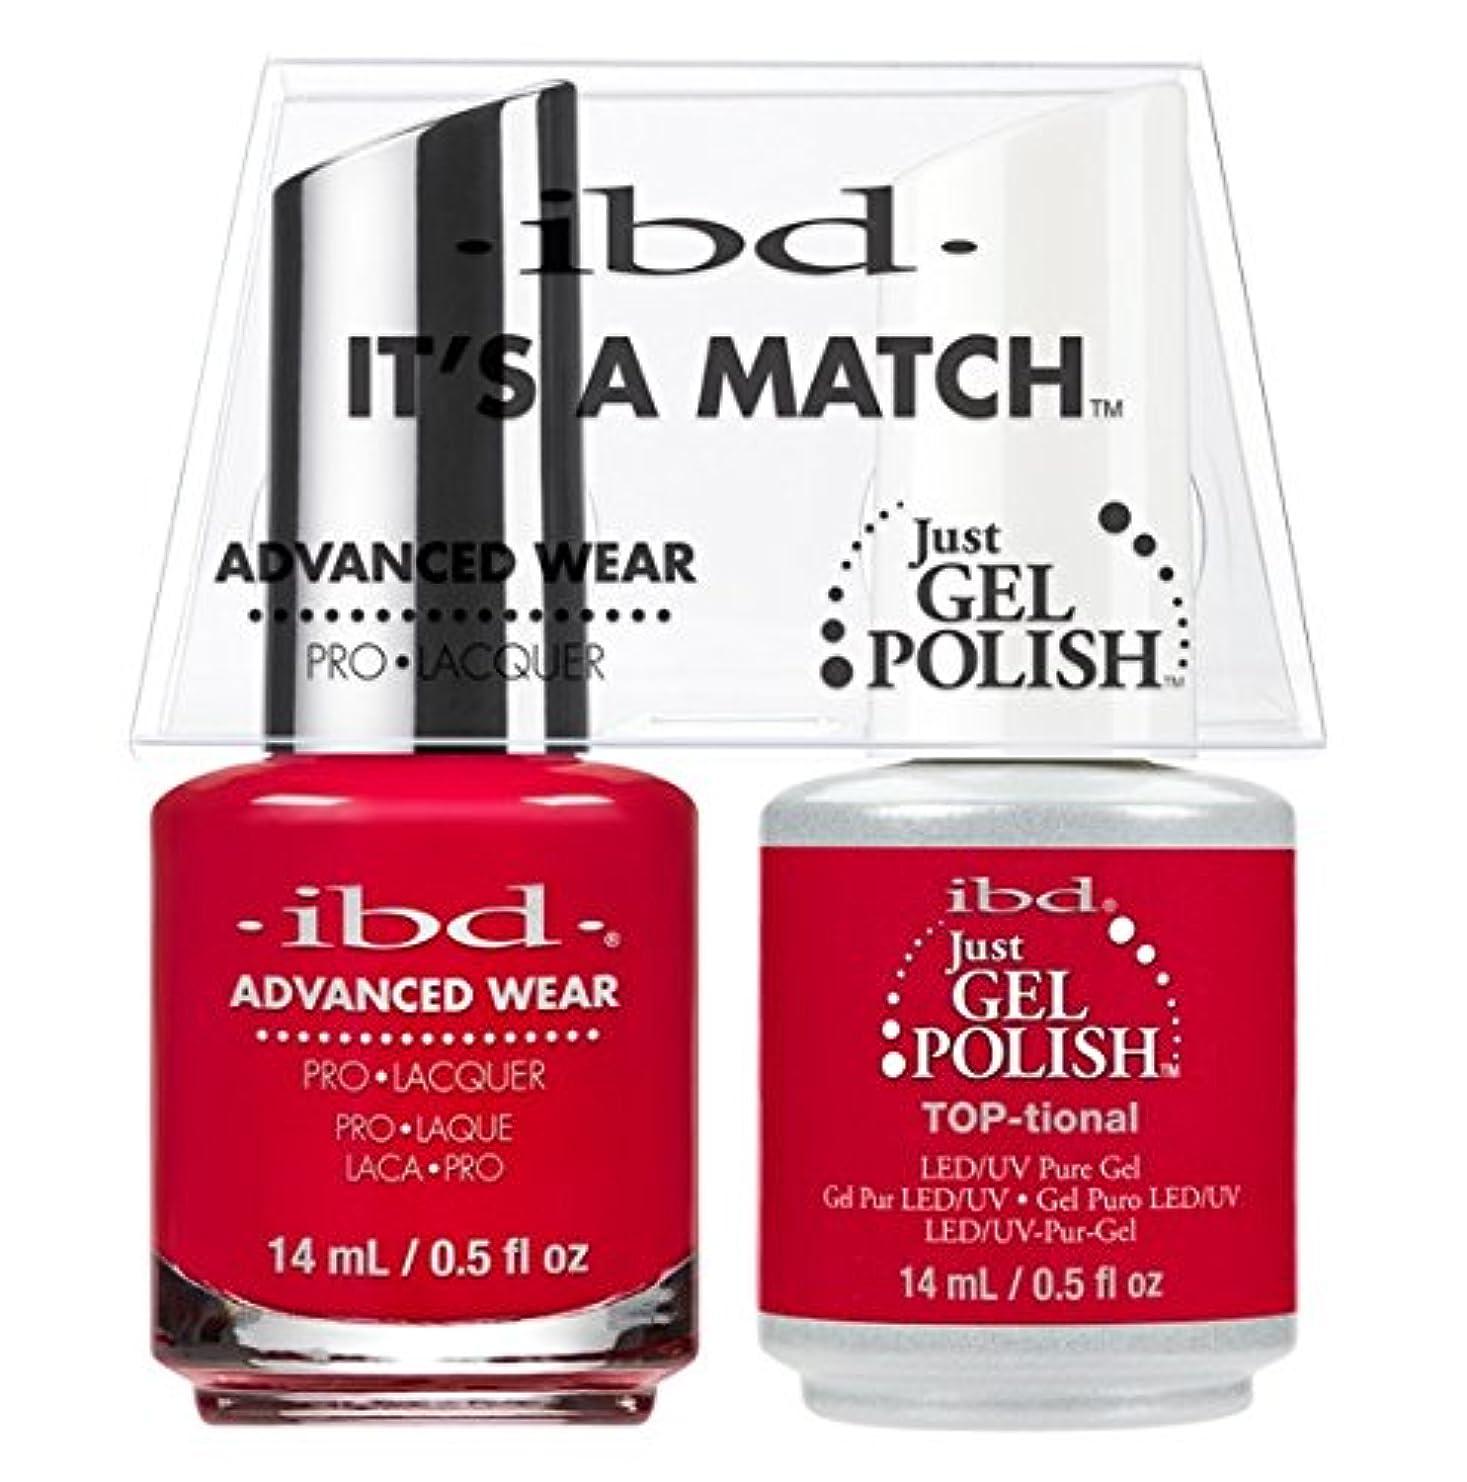 薬用直径慈悲深いibd - It's A Match -Duo Pack- TOP-tional - 14 mL / 0.5 oz Each